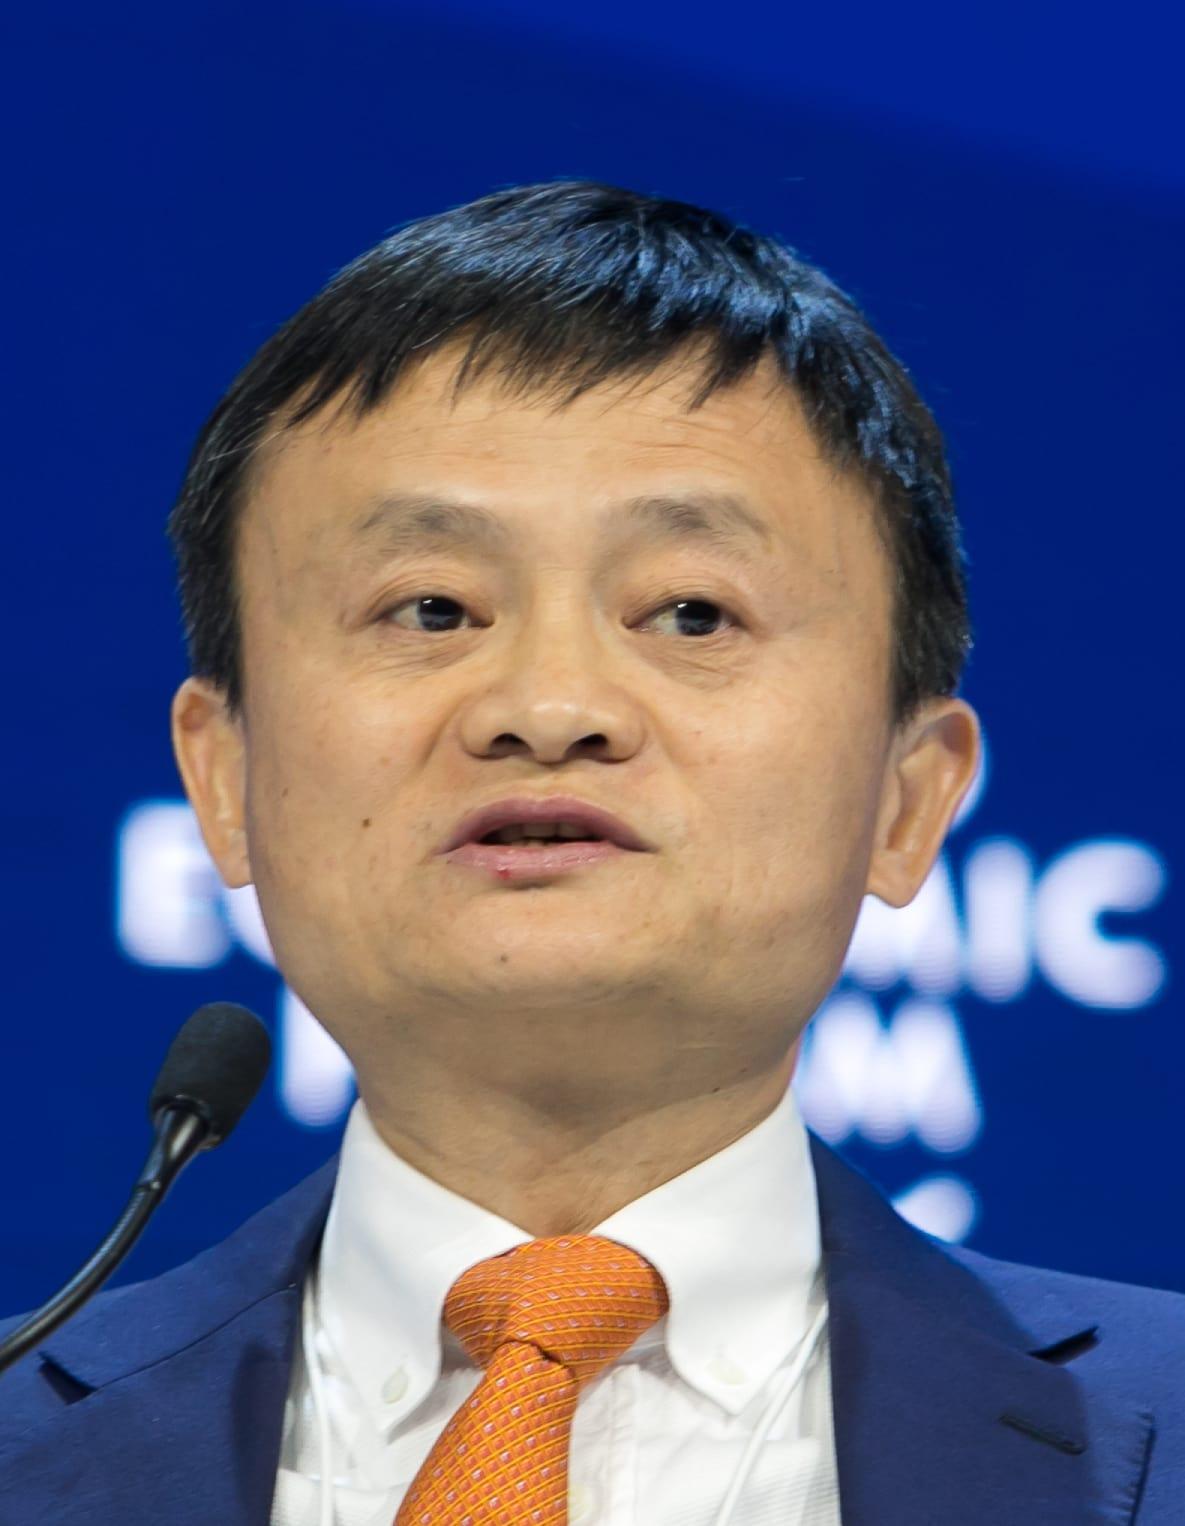 Jack Ma Alibaba-Gründer